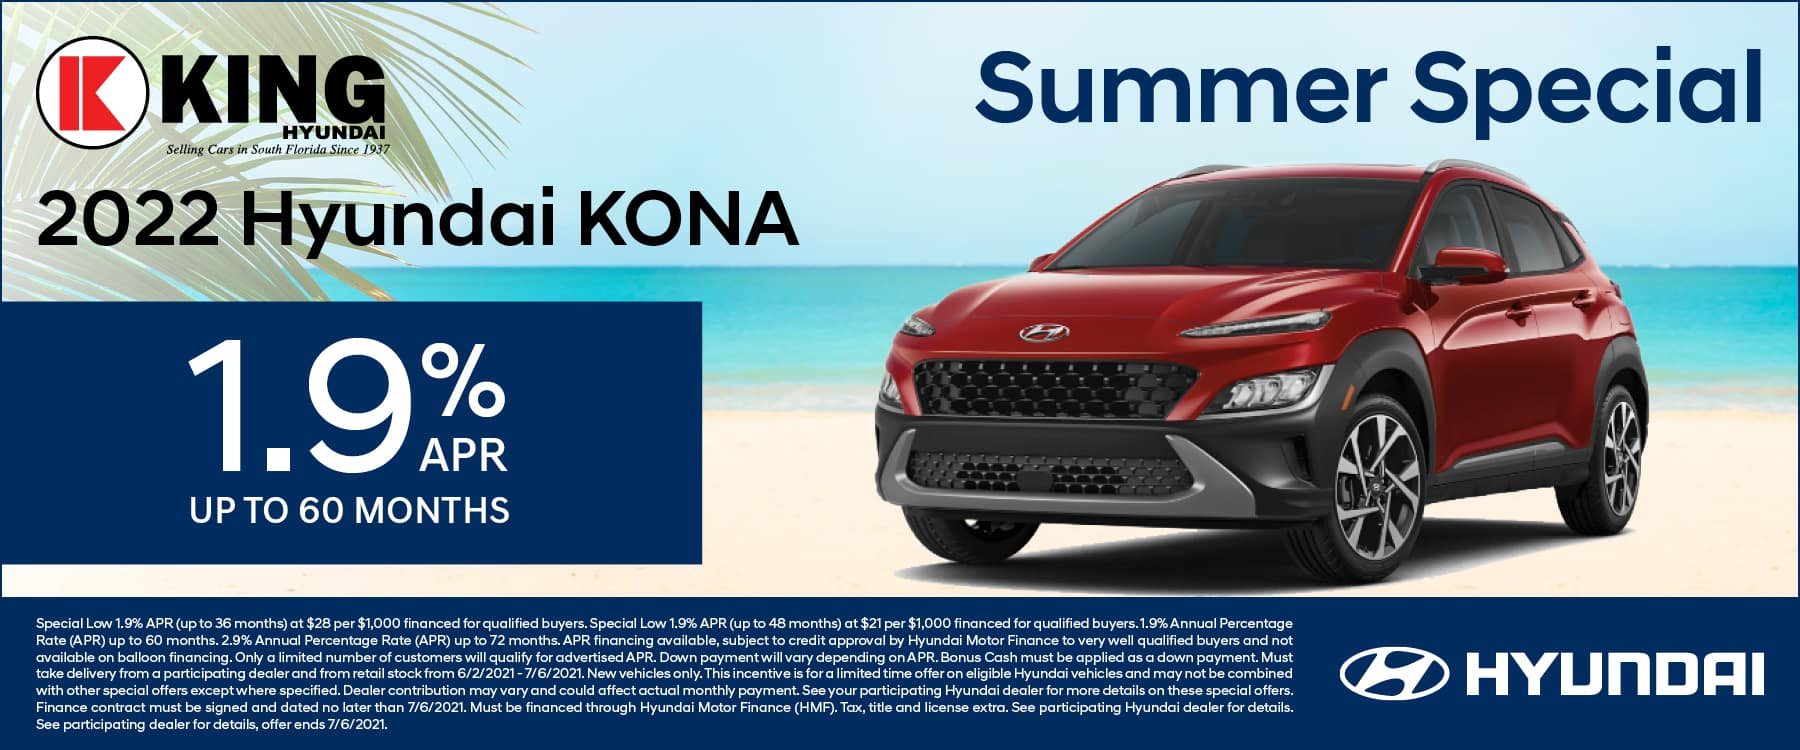 KNH-213253 King Hyundai June Banners 1800×750 Kona APR